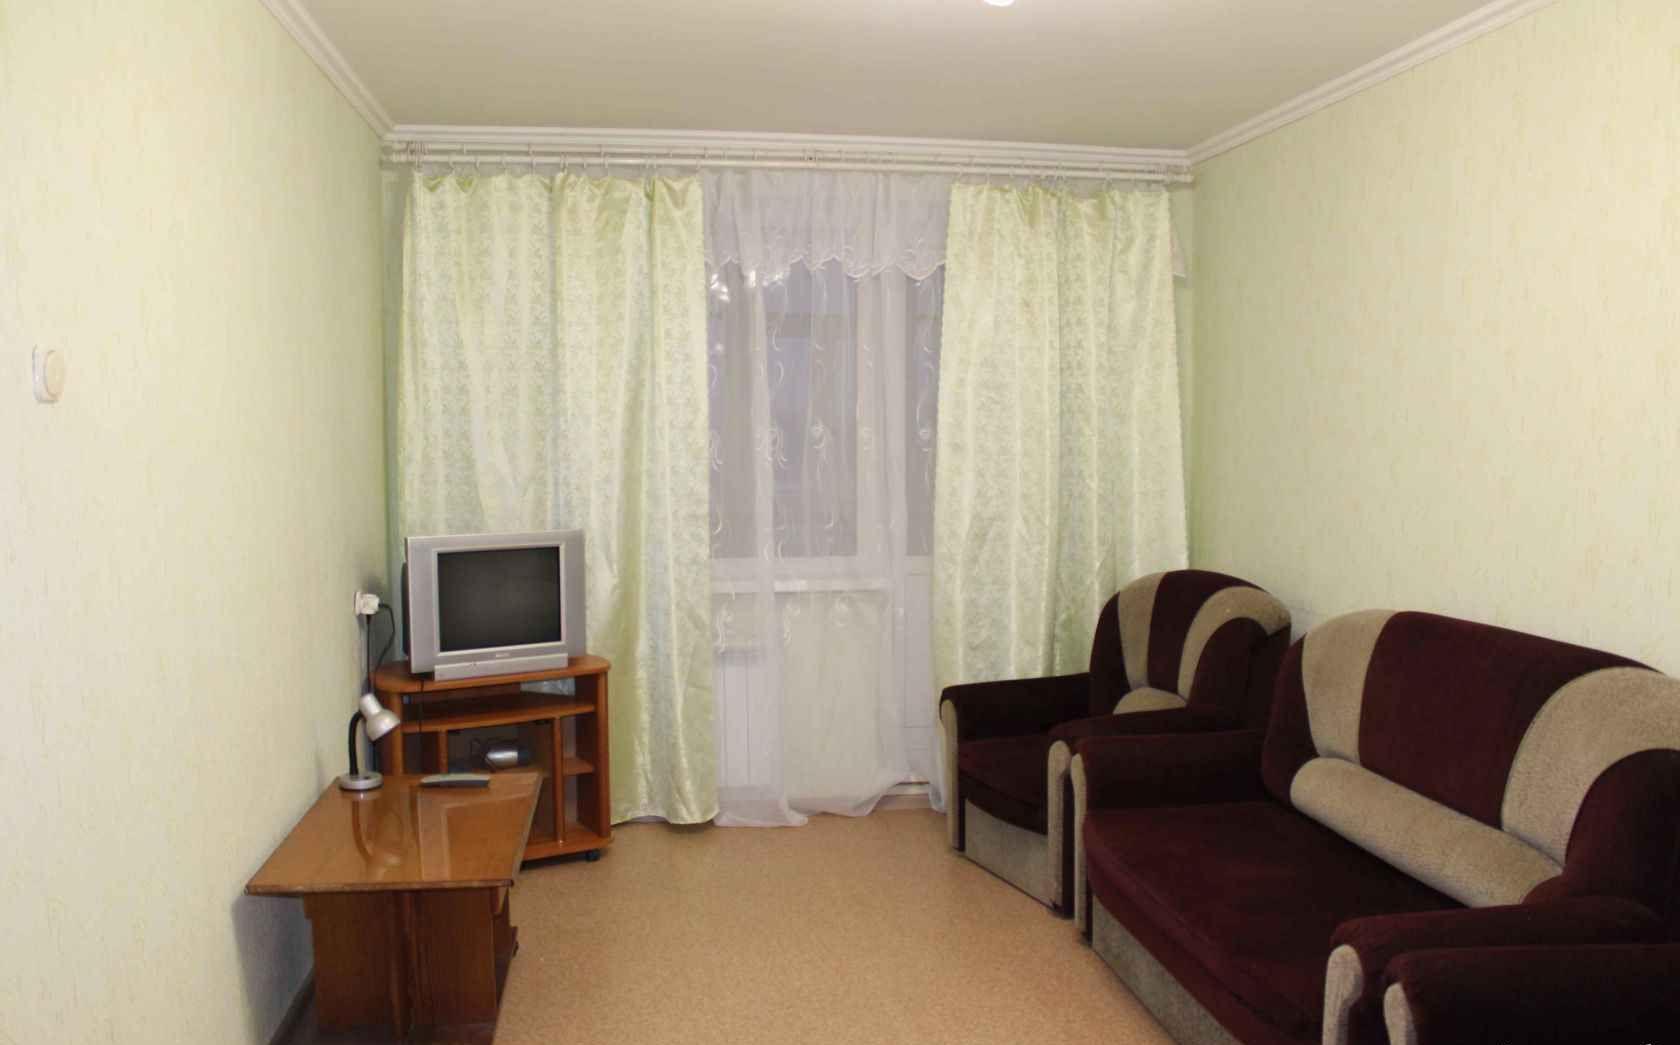 Ремонт квартир в Лужском районе